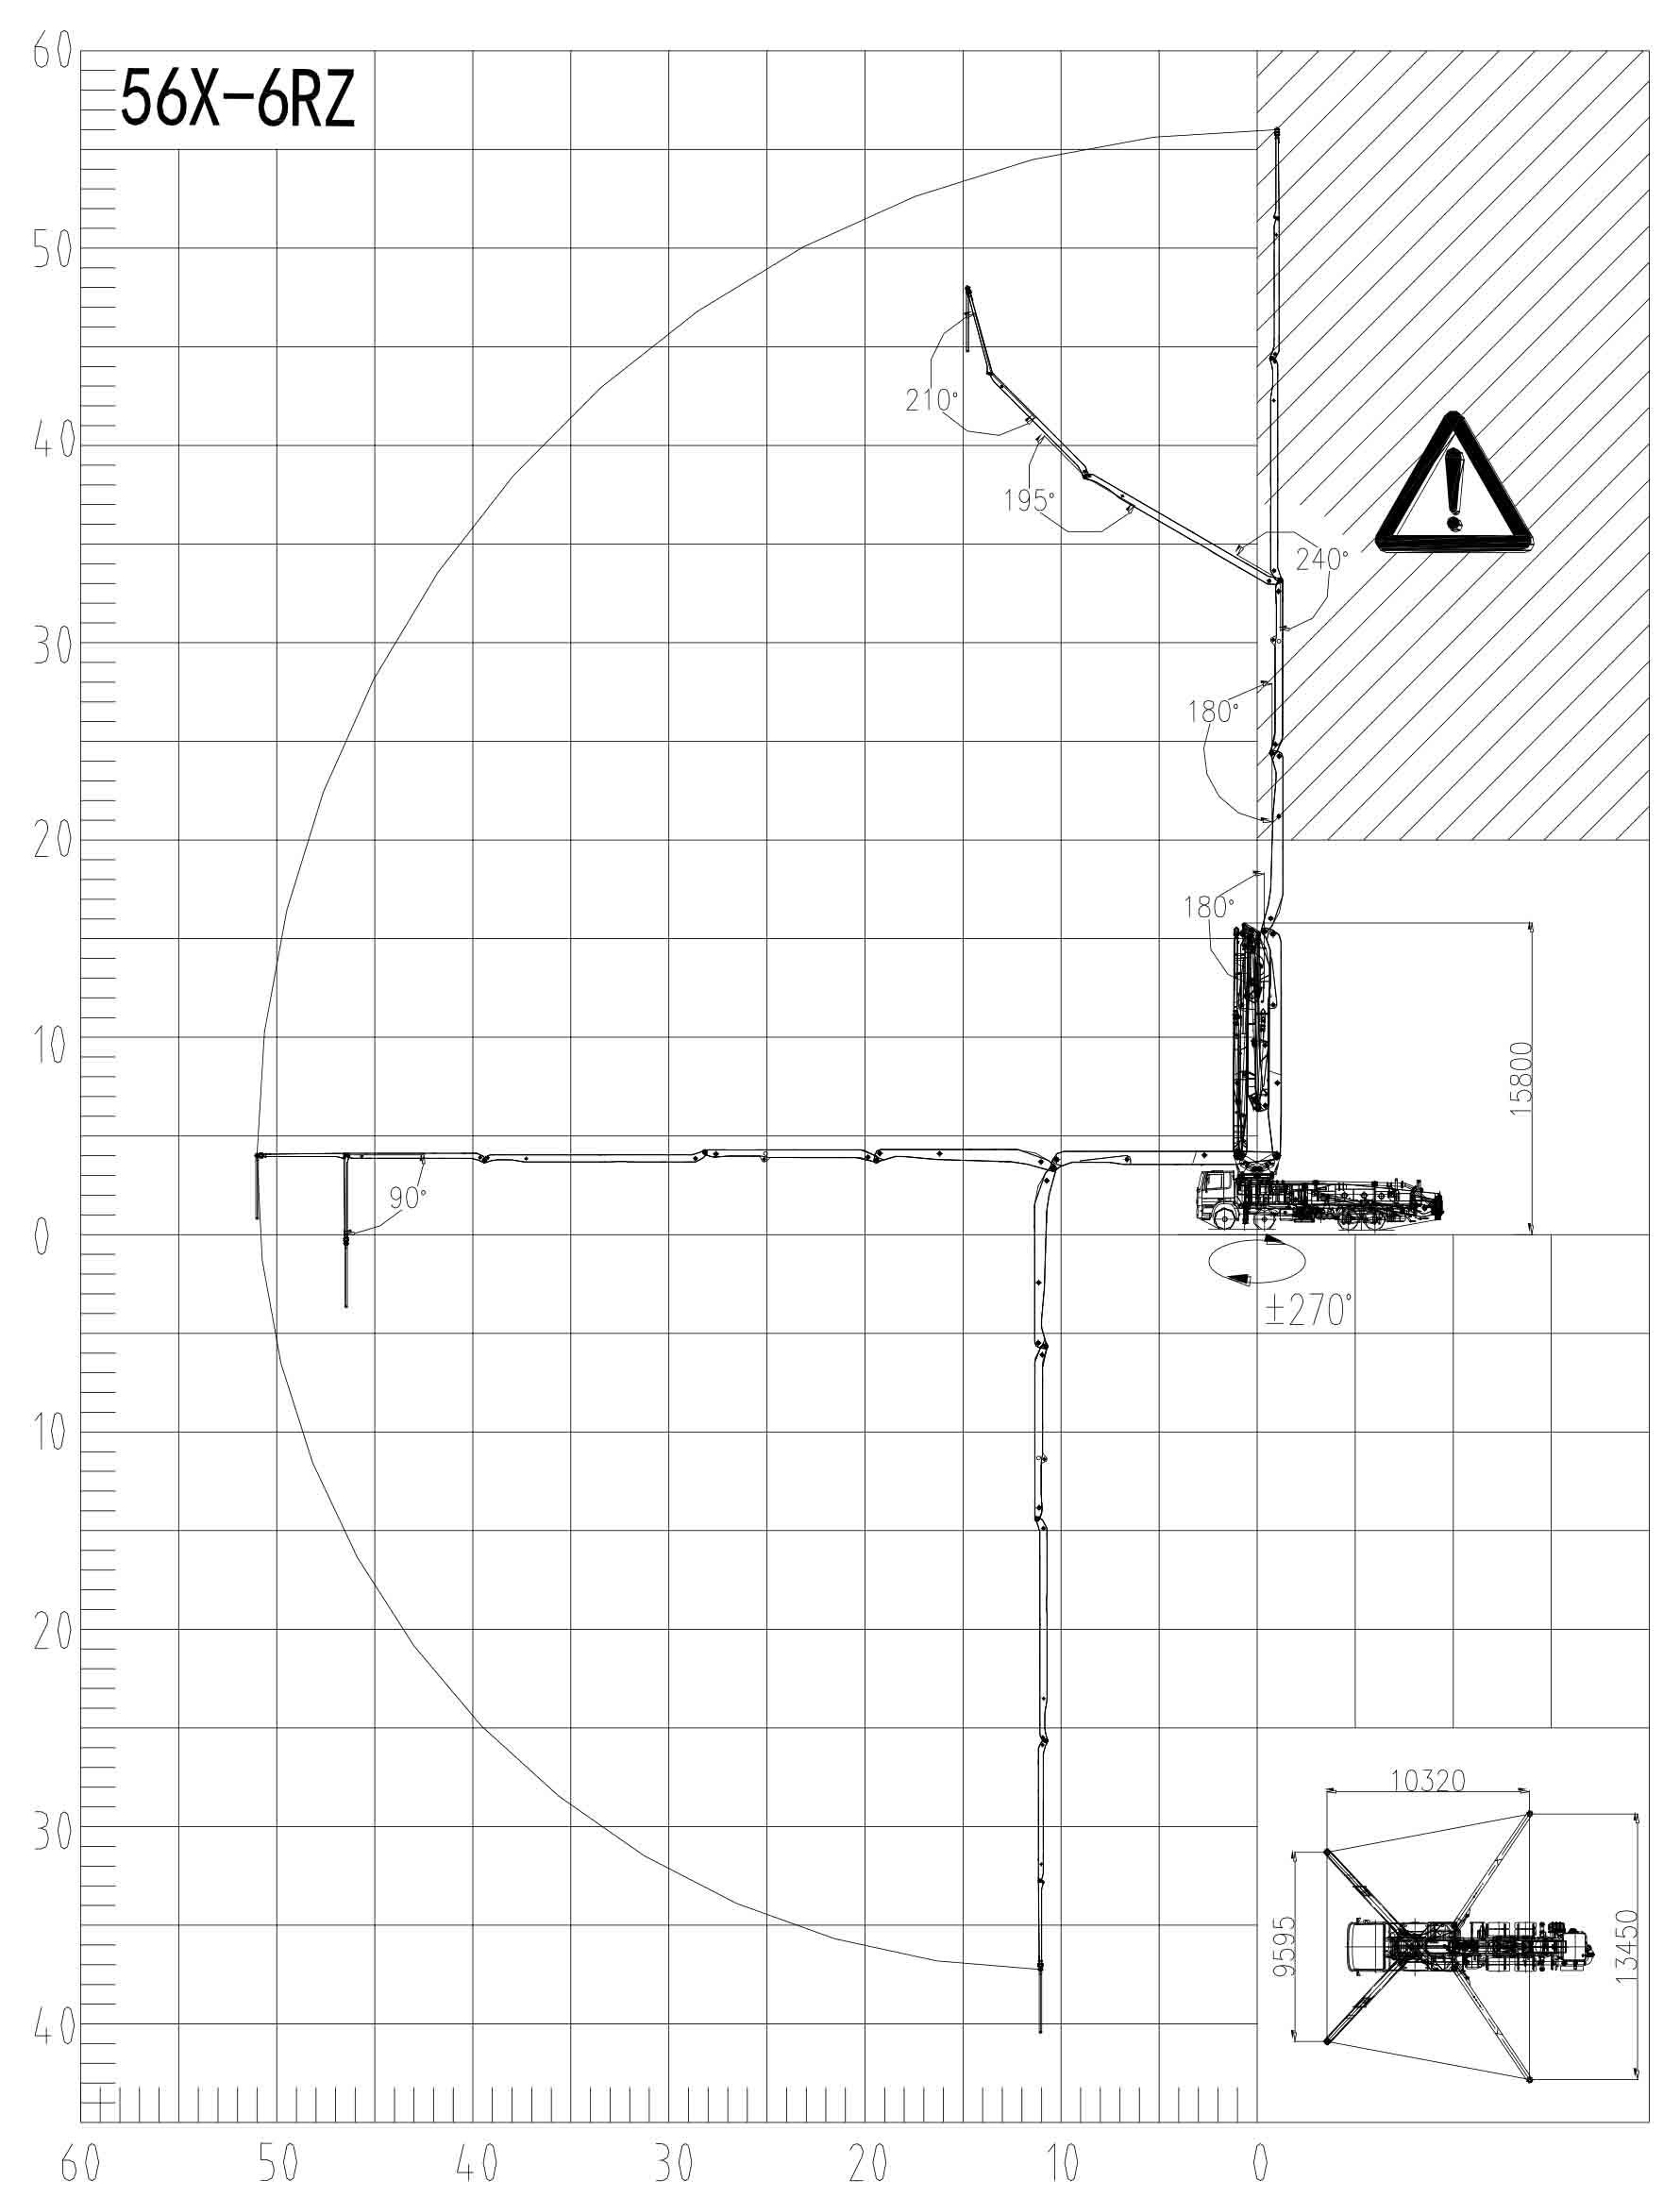 Рабочий диапазон автобетононасоса 56X-6RZ Zoomlion